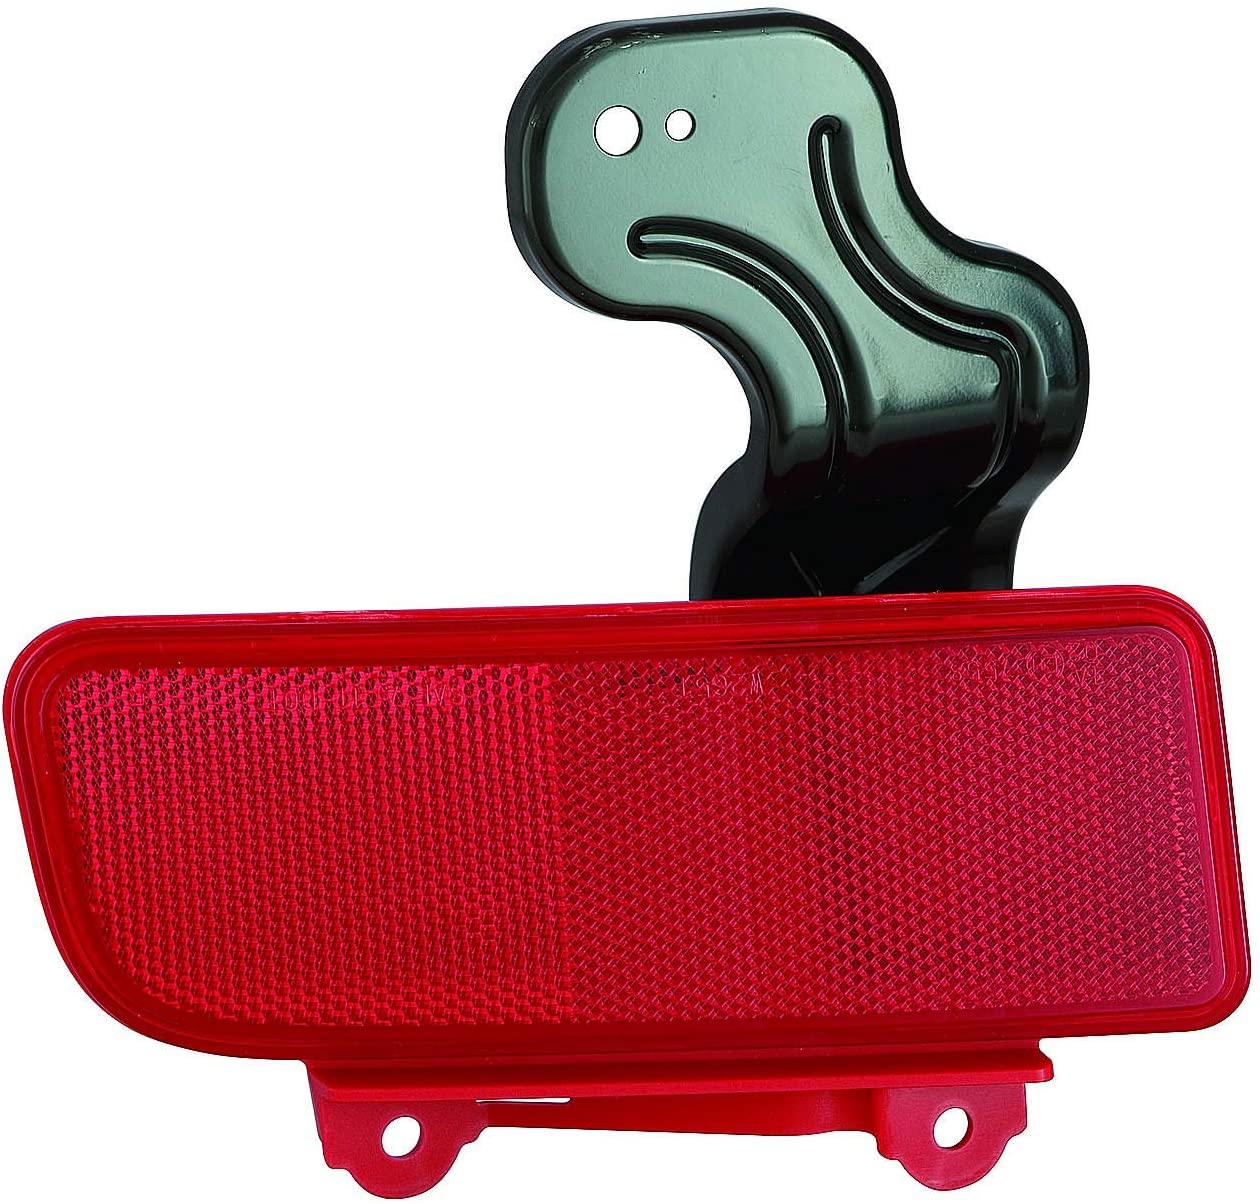 ACK Automotive Light for Honda CRV 15-16 Rear Reflector LH US Driver